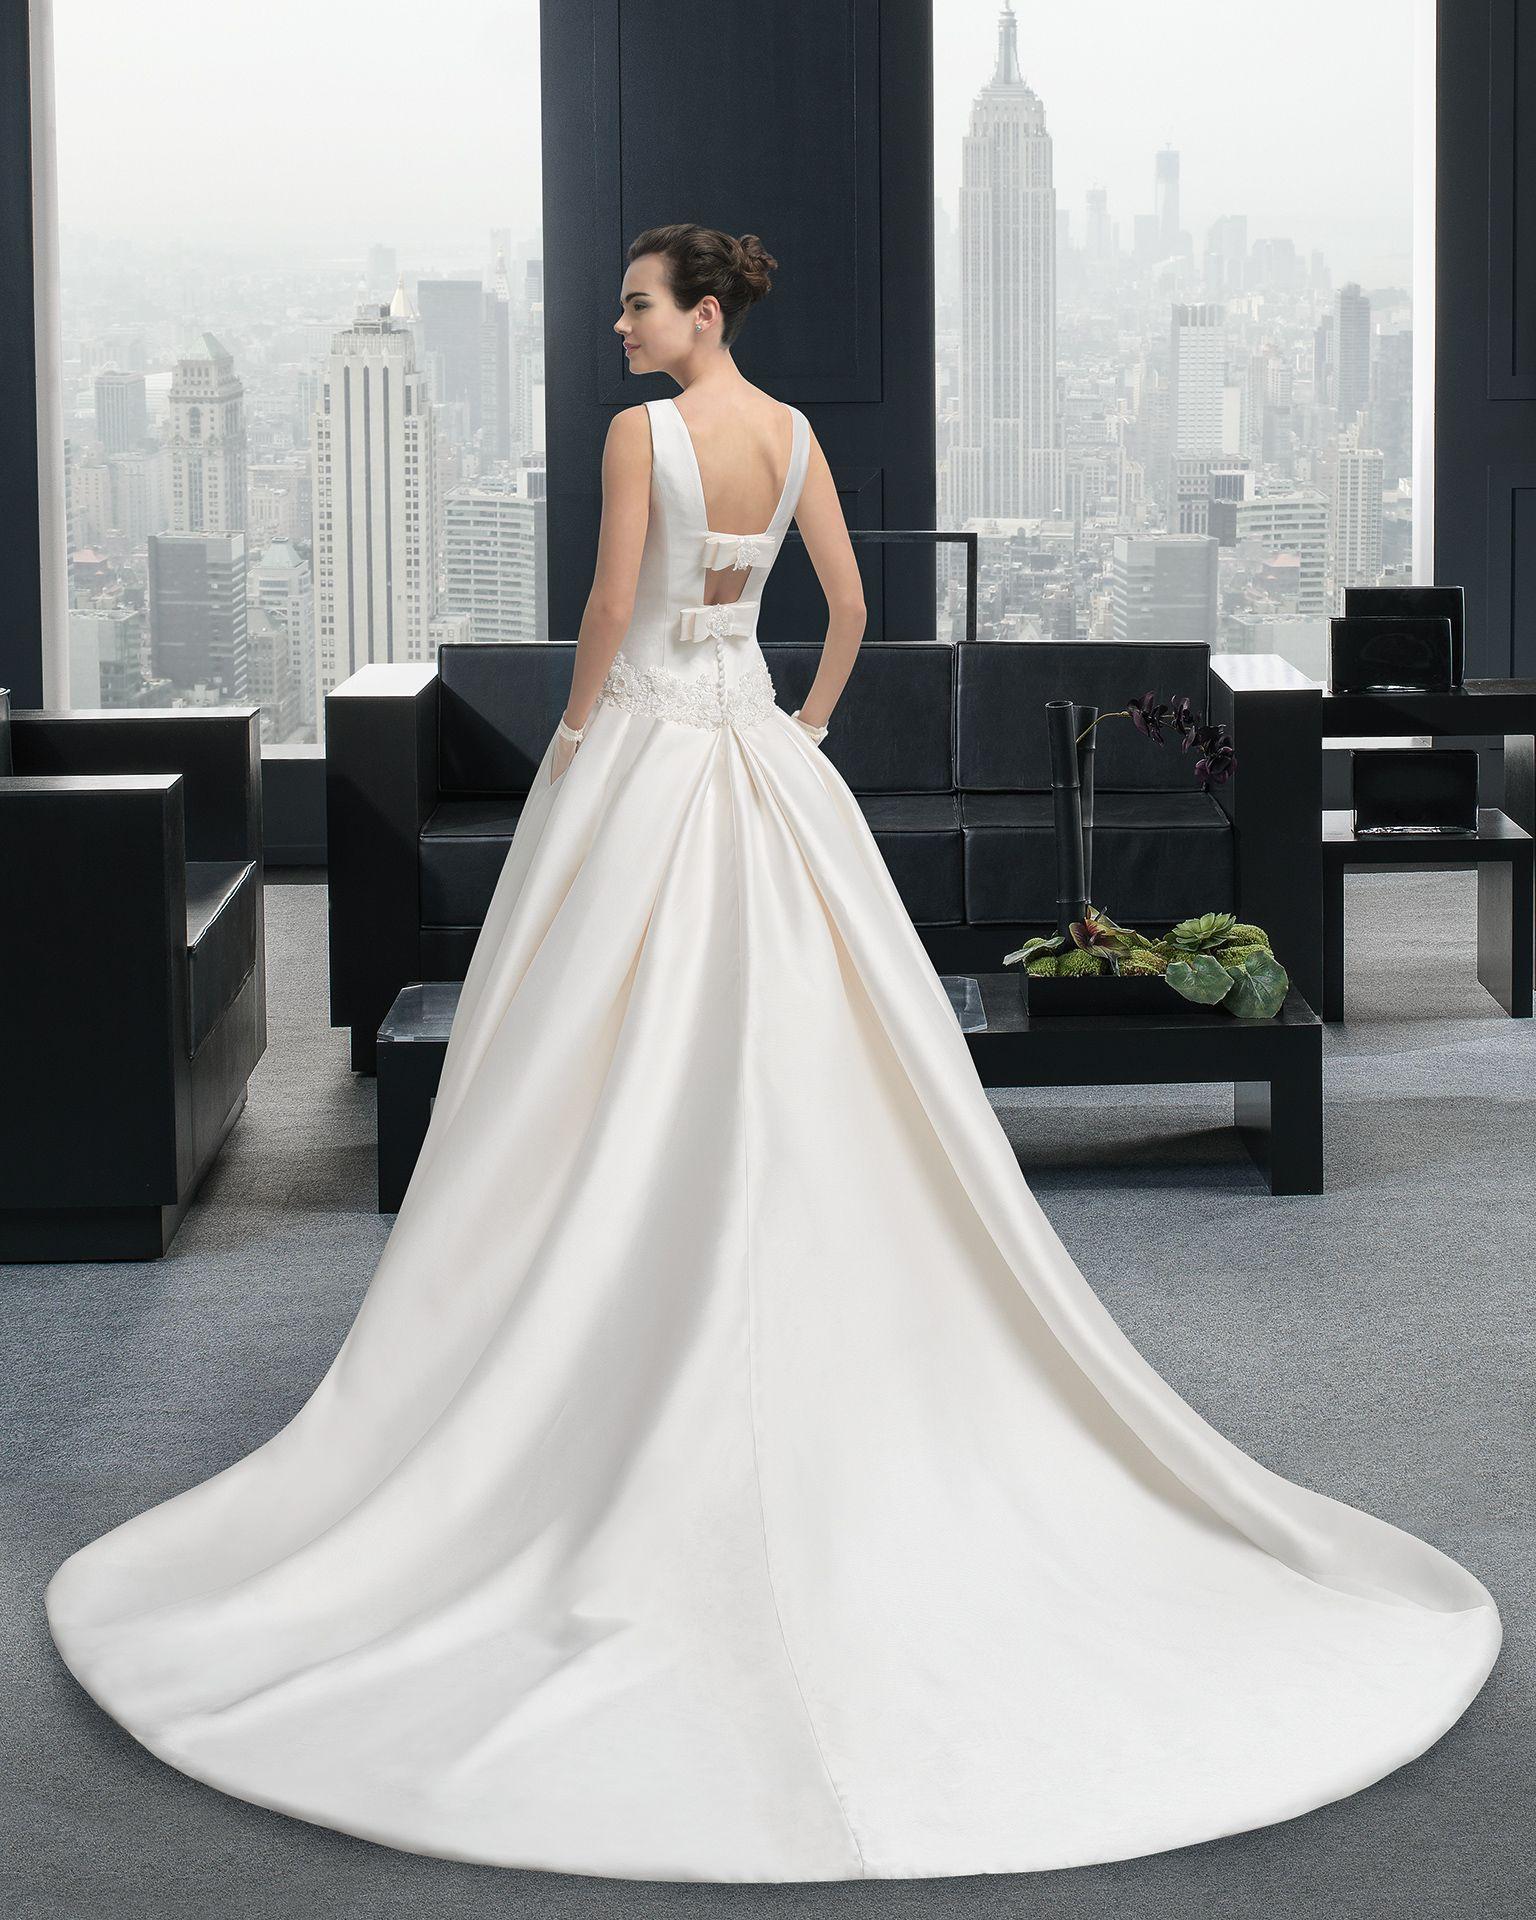 Rimini - Rosa Clará Two 2016 Bridal Collection